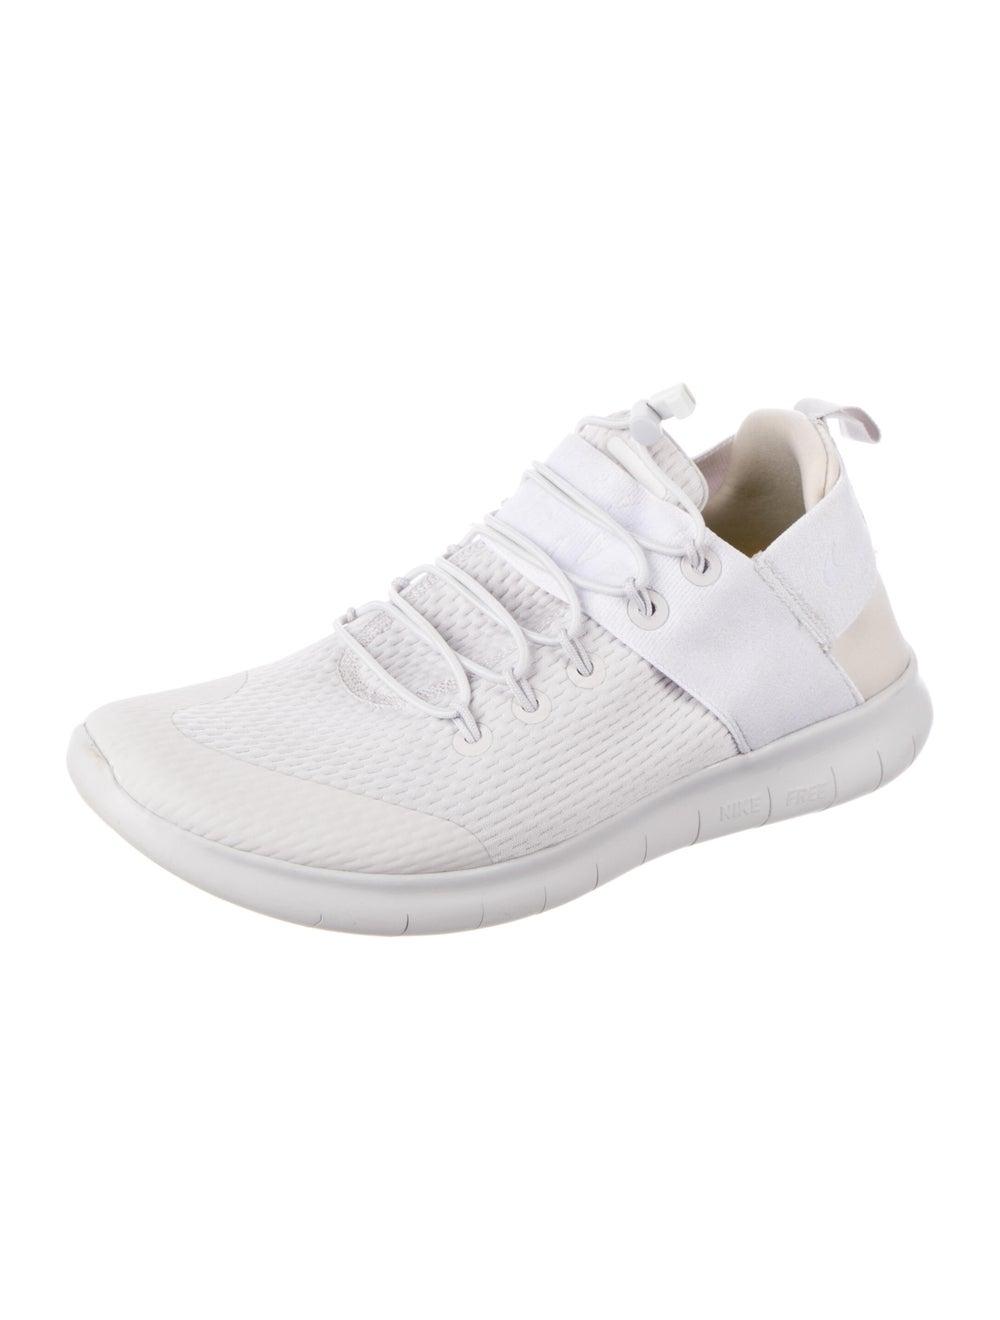 Nike Sneakers White - image 2